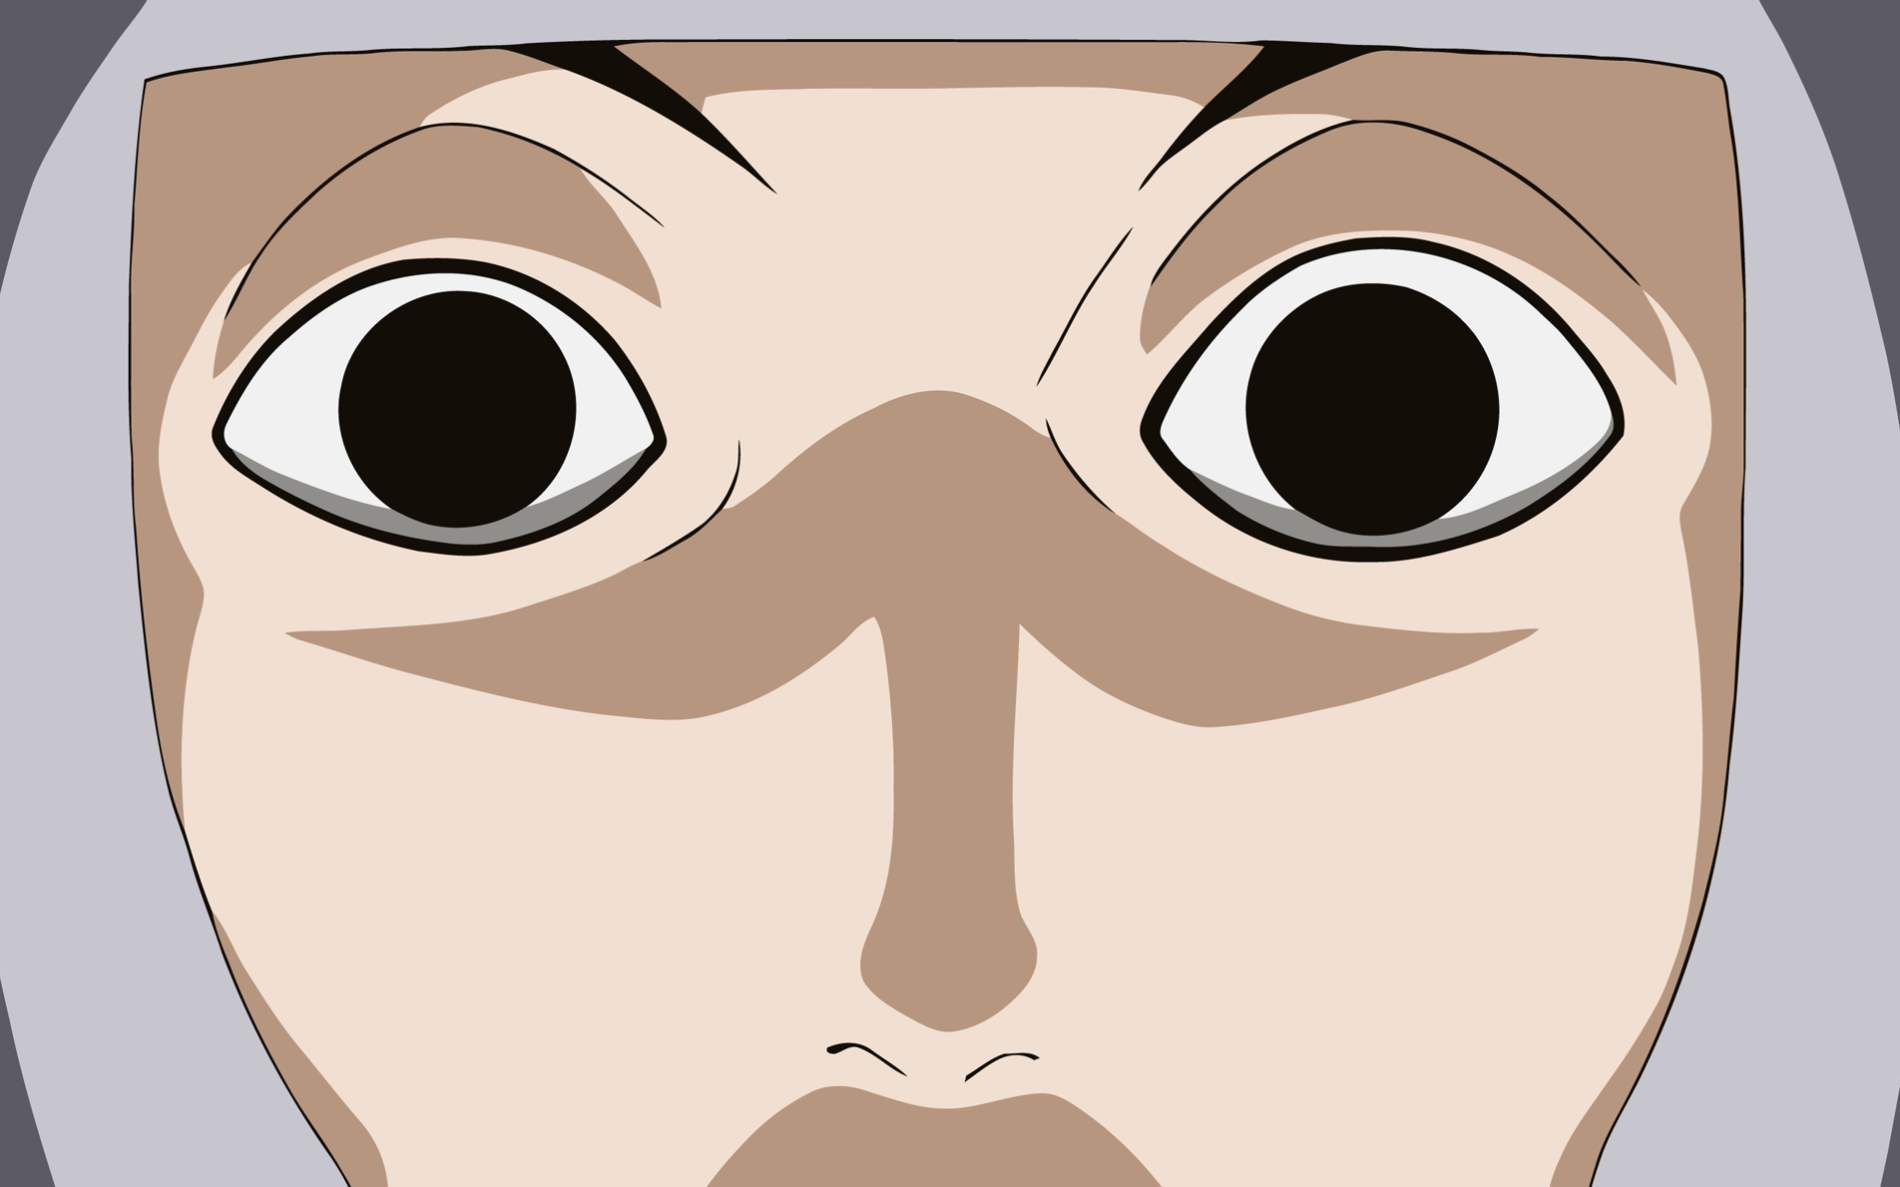 Popular Wallpaper Naruto Face - 900c5a65069dfe8f19e45a8ce4a7d206  Image_732422.jpg